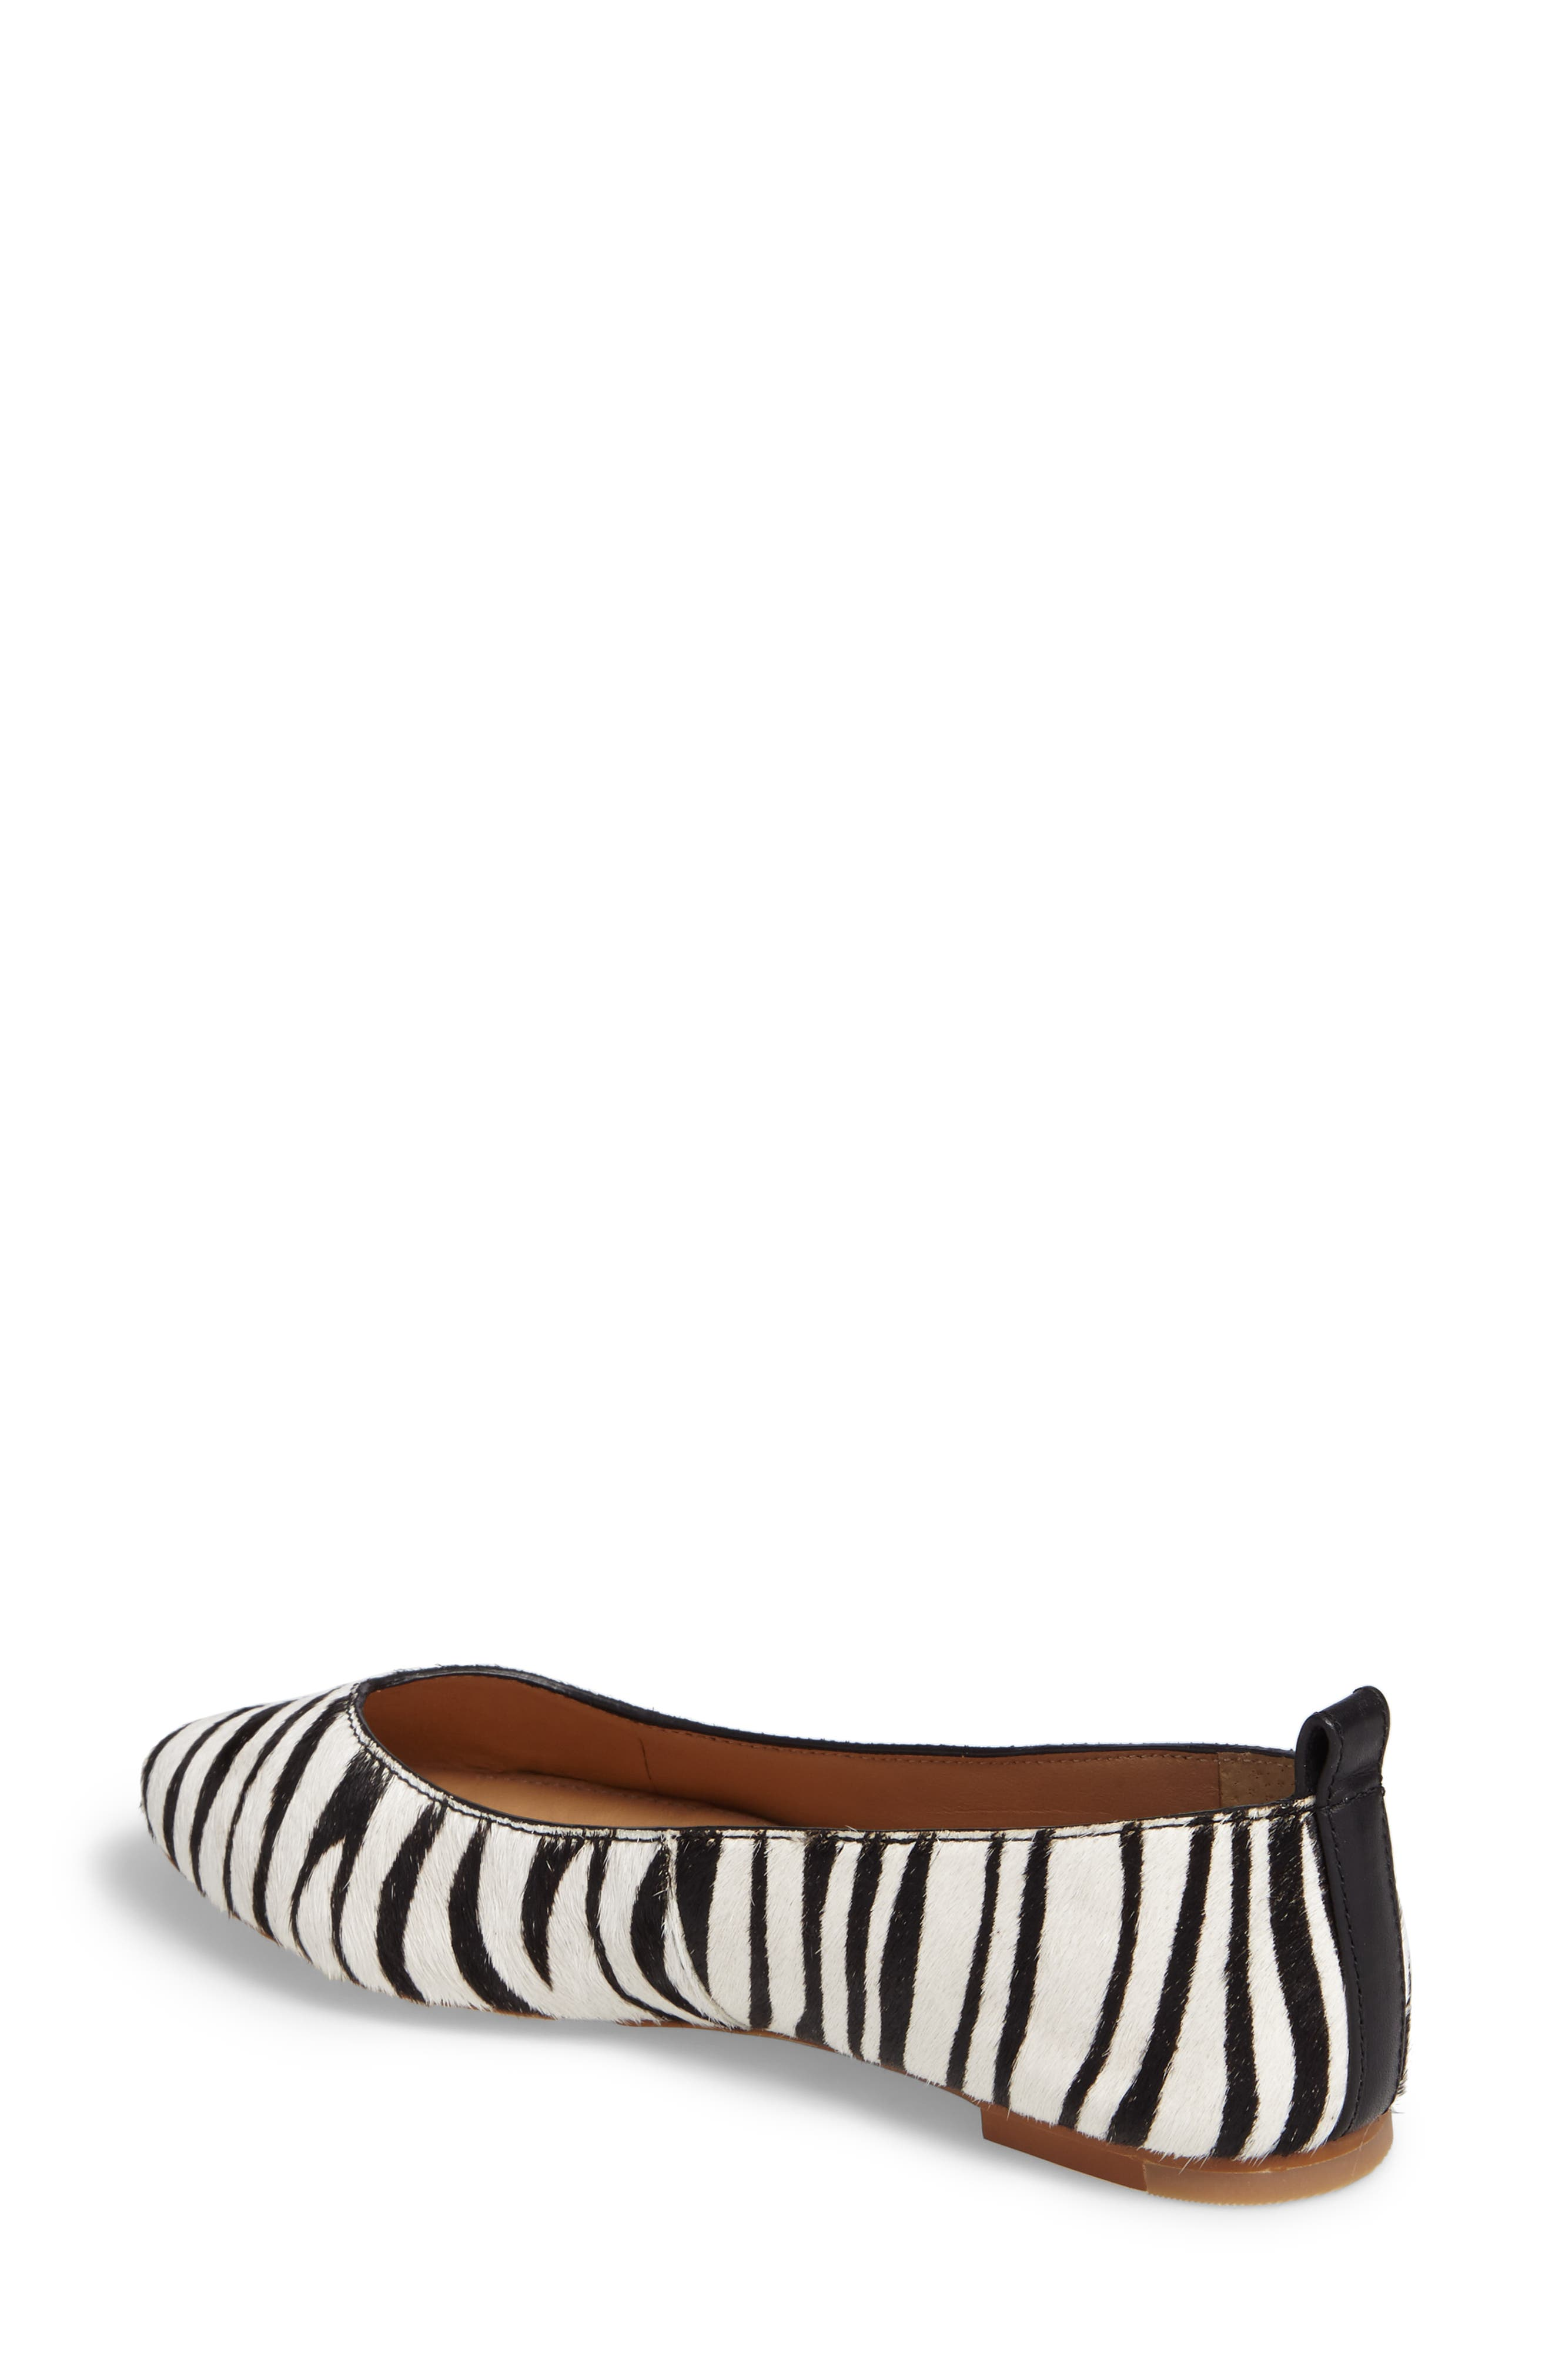 Lynley Genuine Calf Hair Flat,                             Alternate thumbnail 2, color,                             Zebra Calf Hair Leather